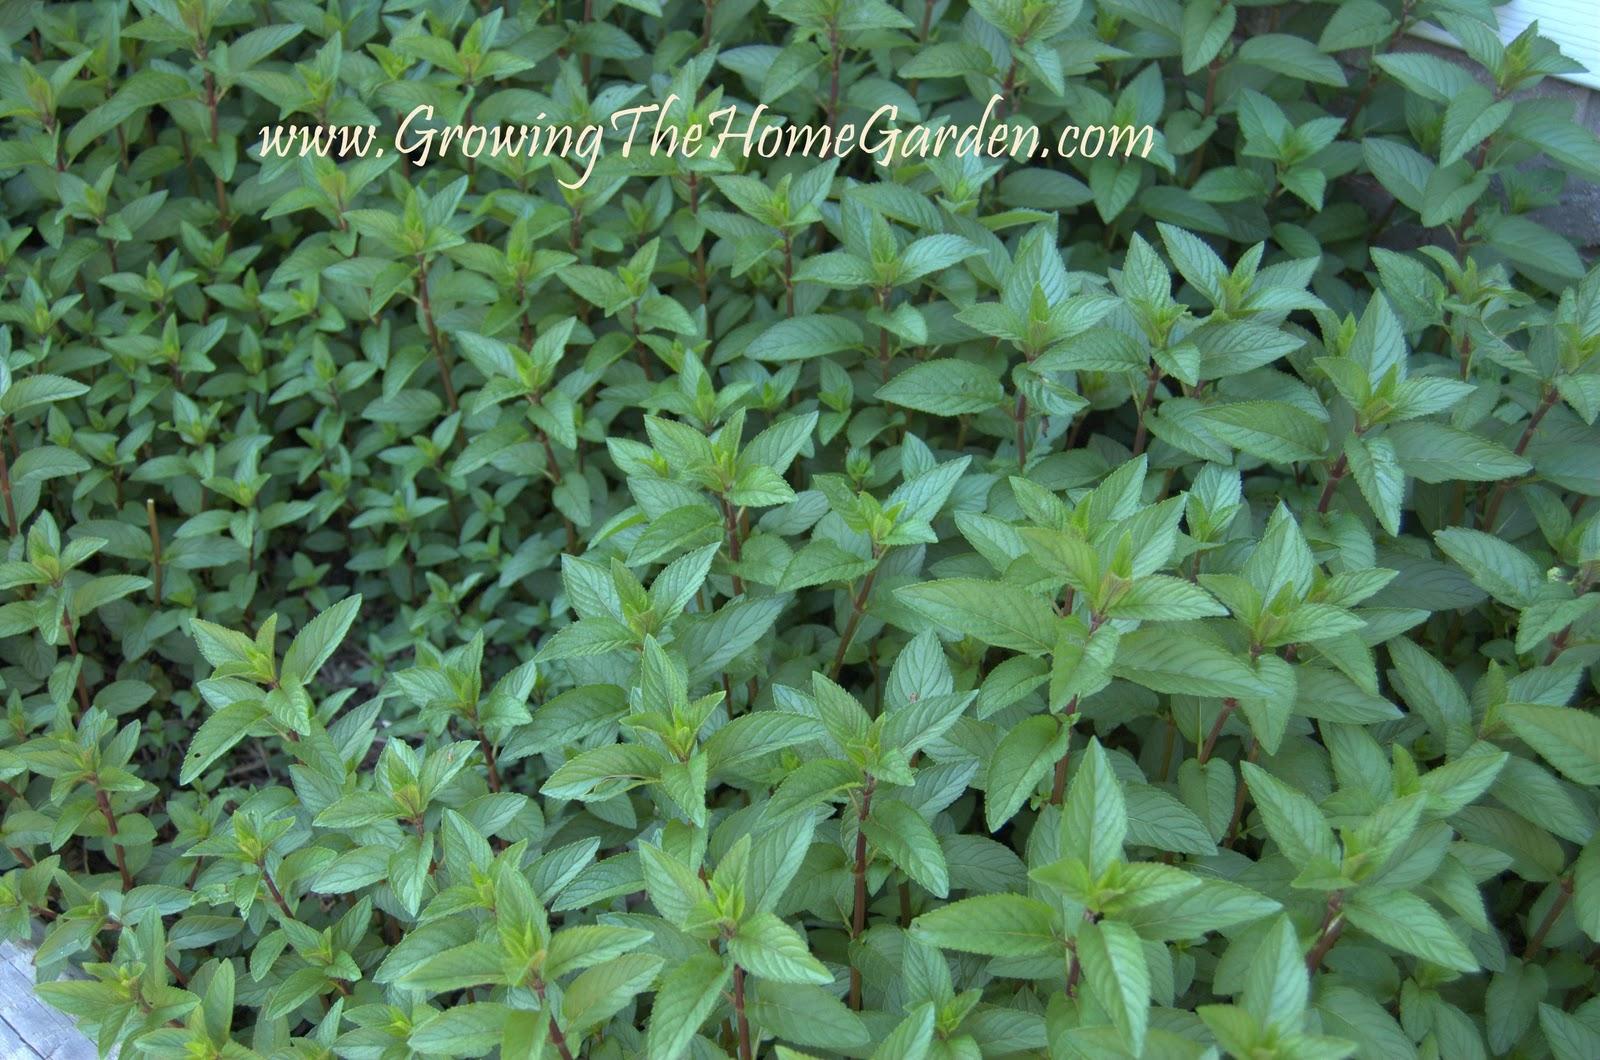 Mint Mayhem! (The Herbs) - Growing The Home Garden